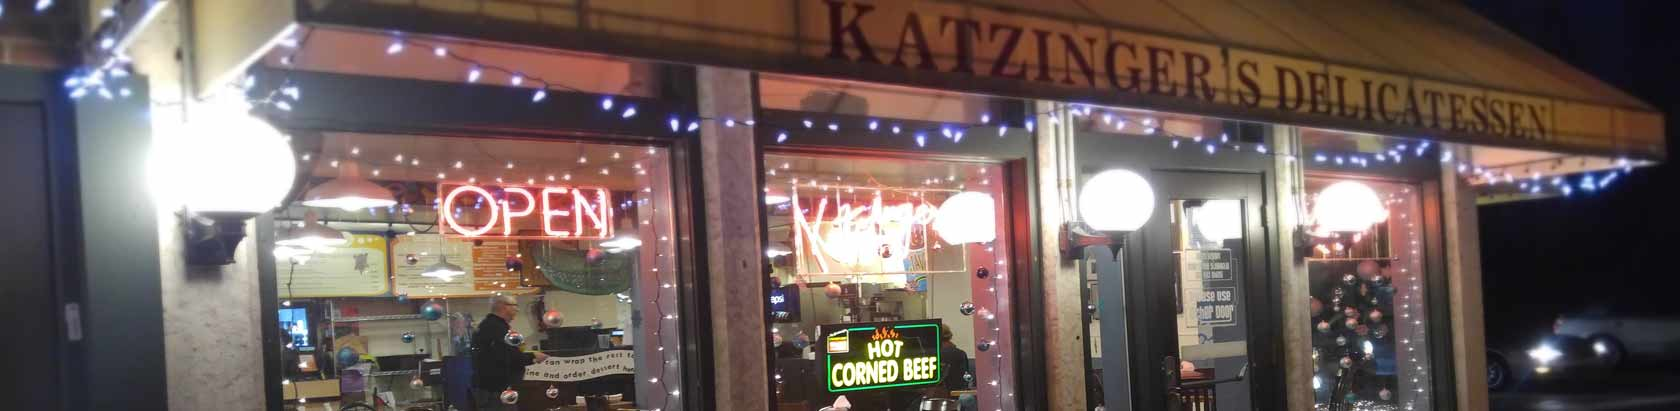 Katzingers Delicatessen exterior